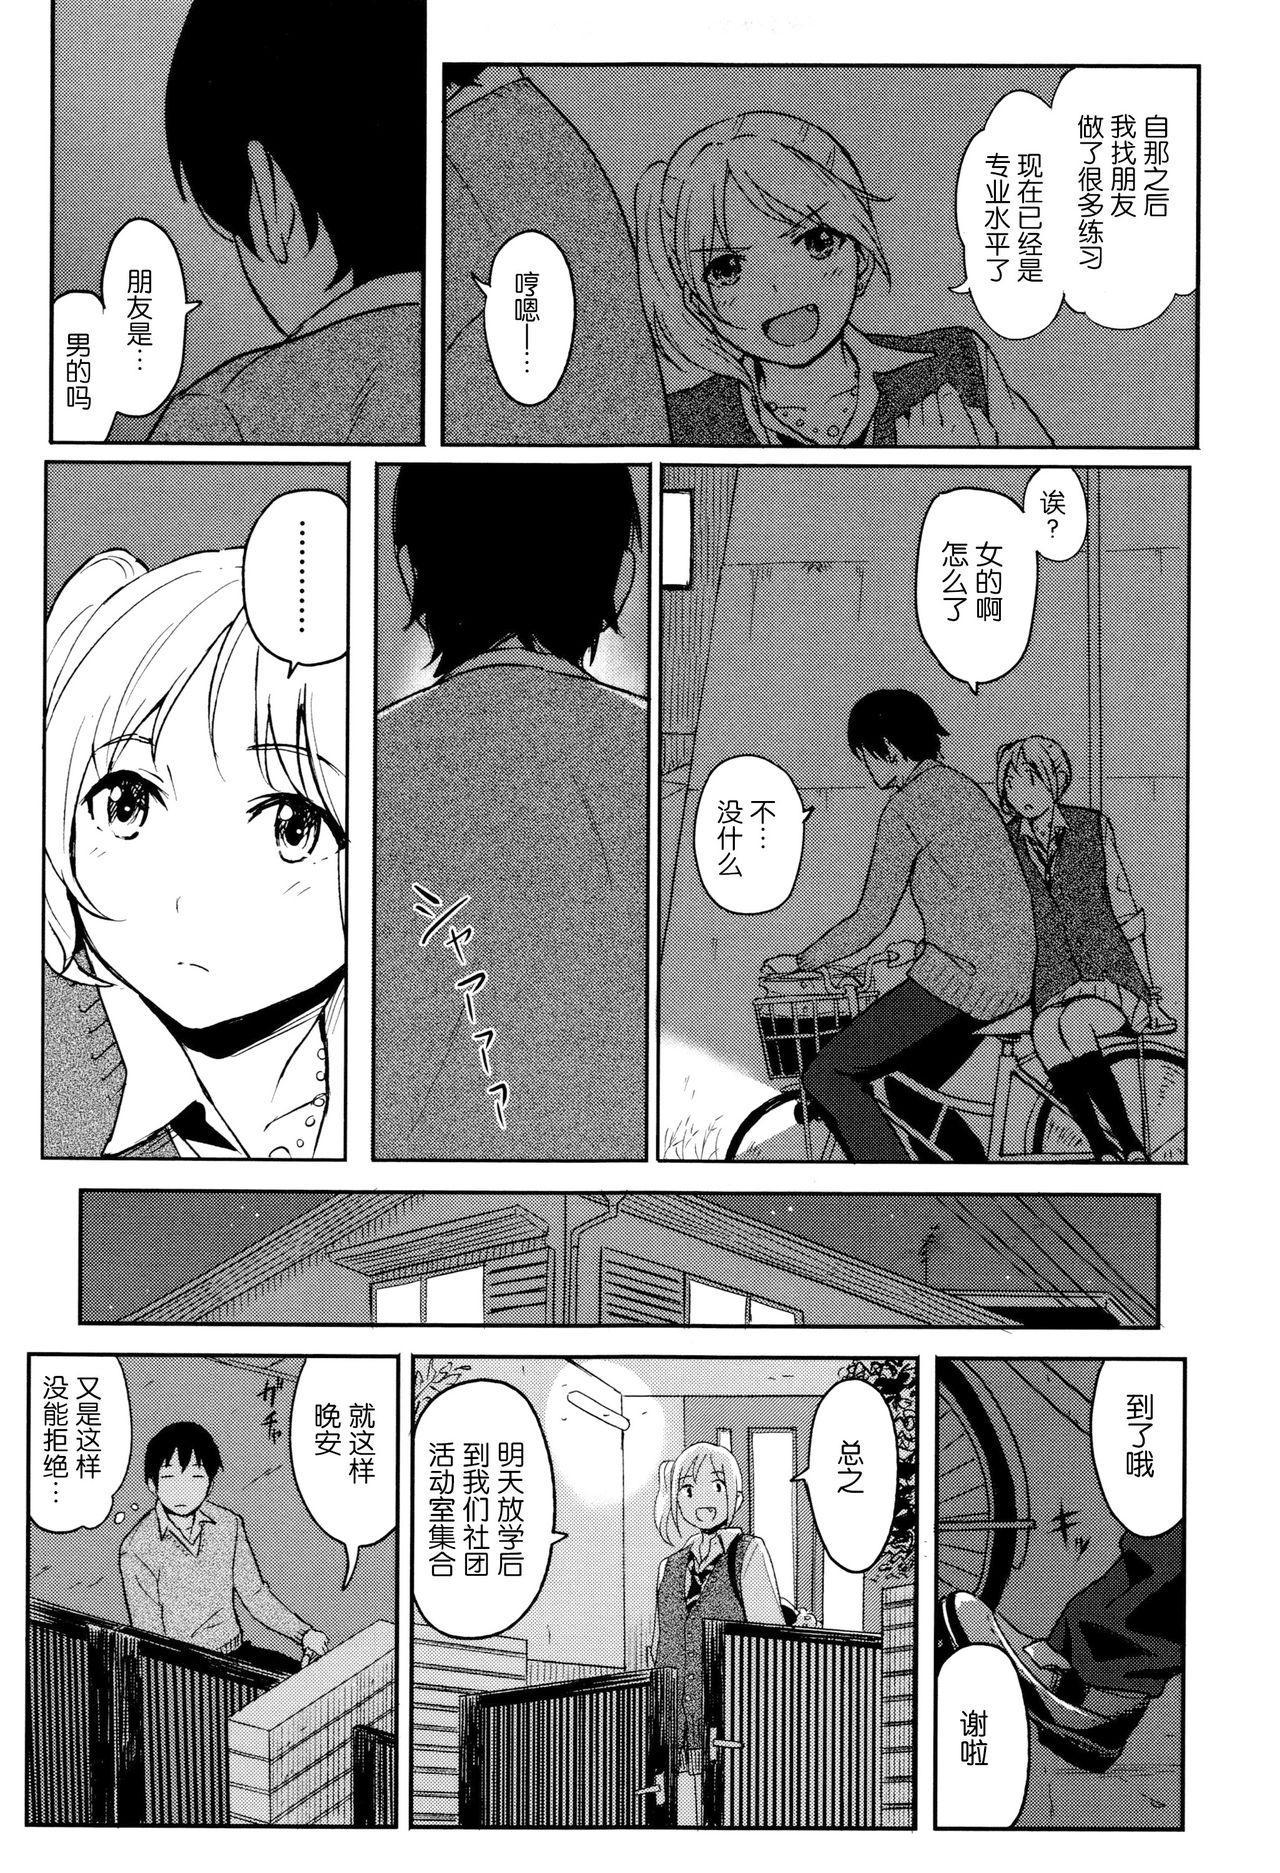 Tokubetsu na Mainichi - Special daily 49